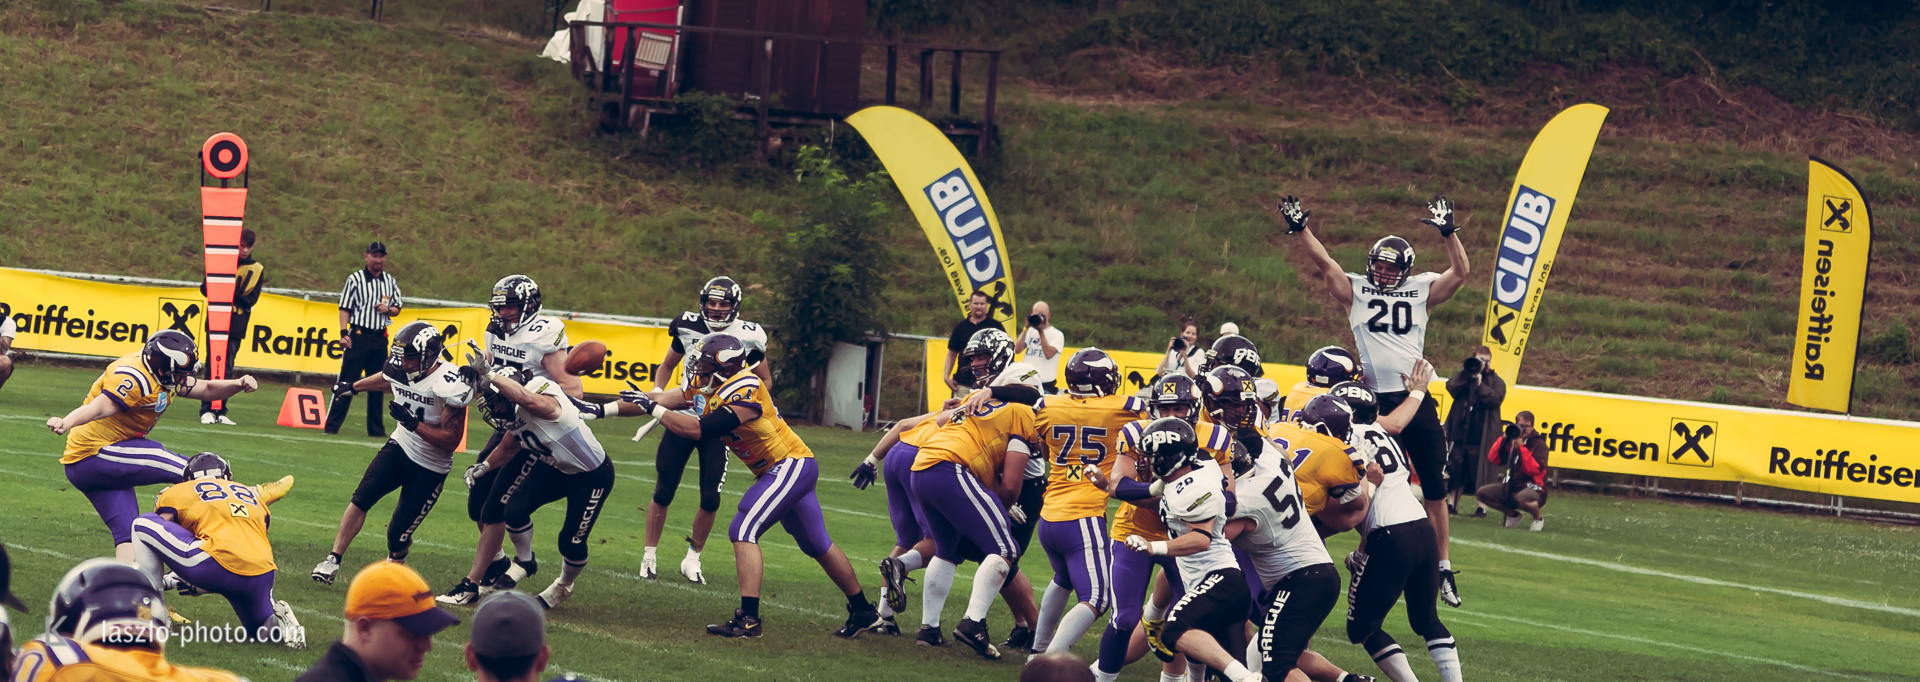 Vikings vs. Panthers